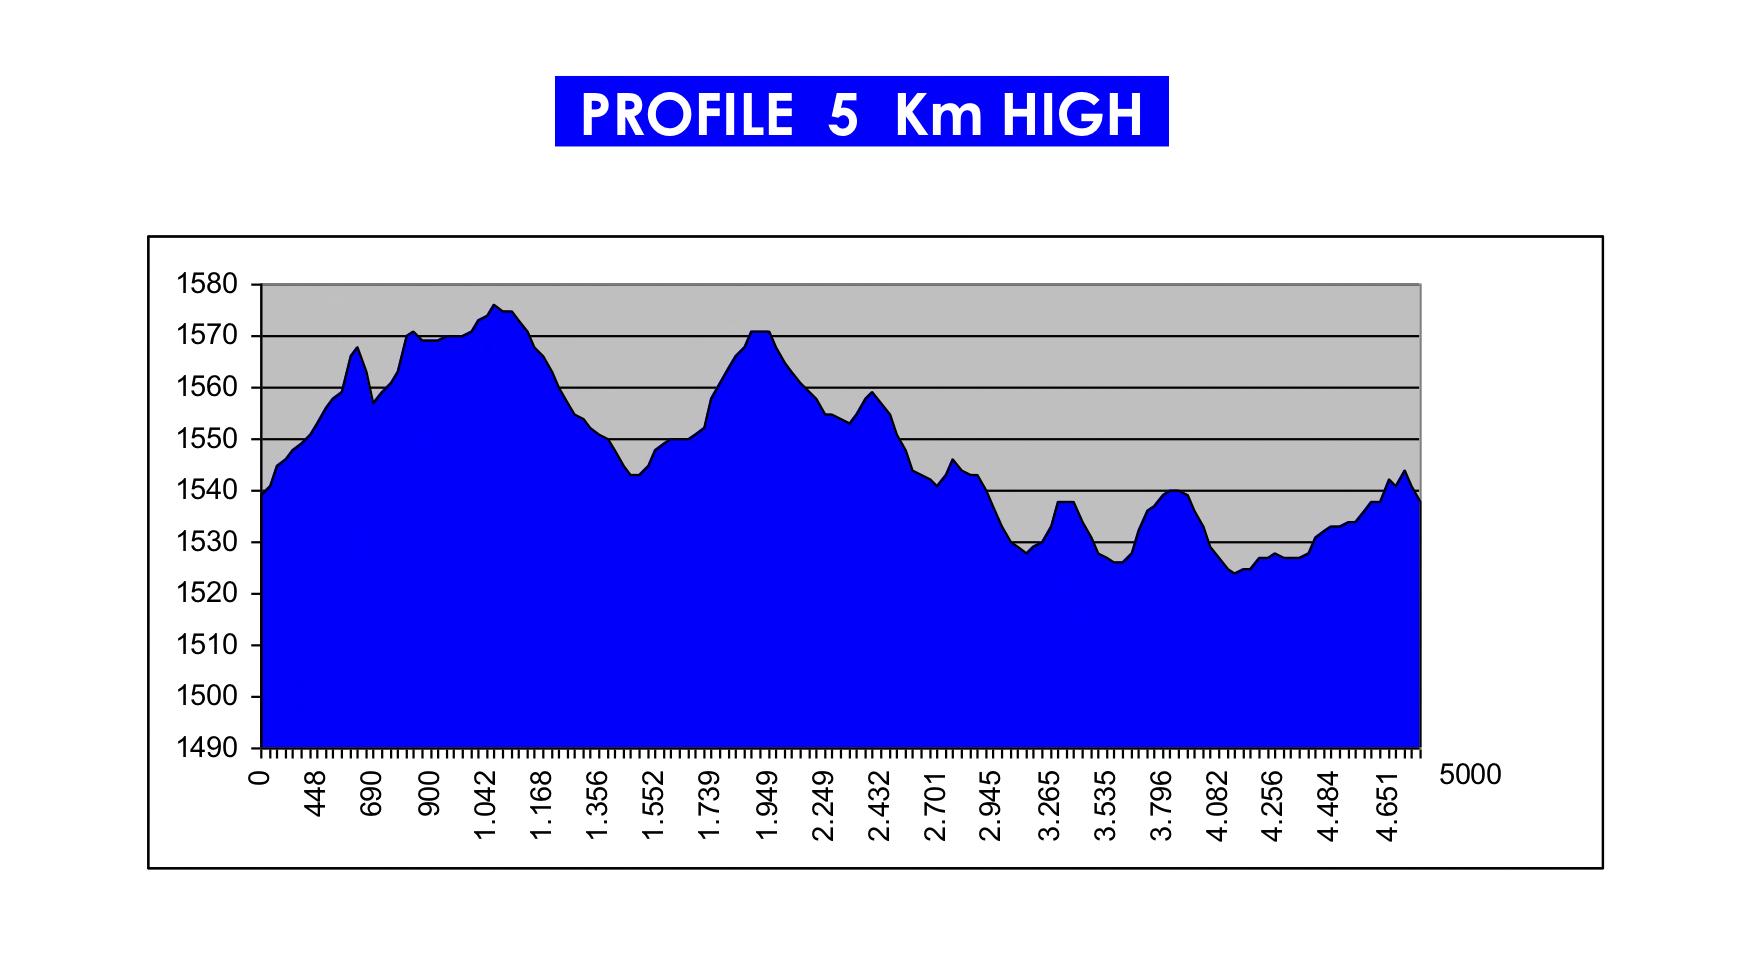 Piste WMA EN 5km HIGH profile